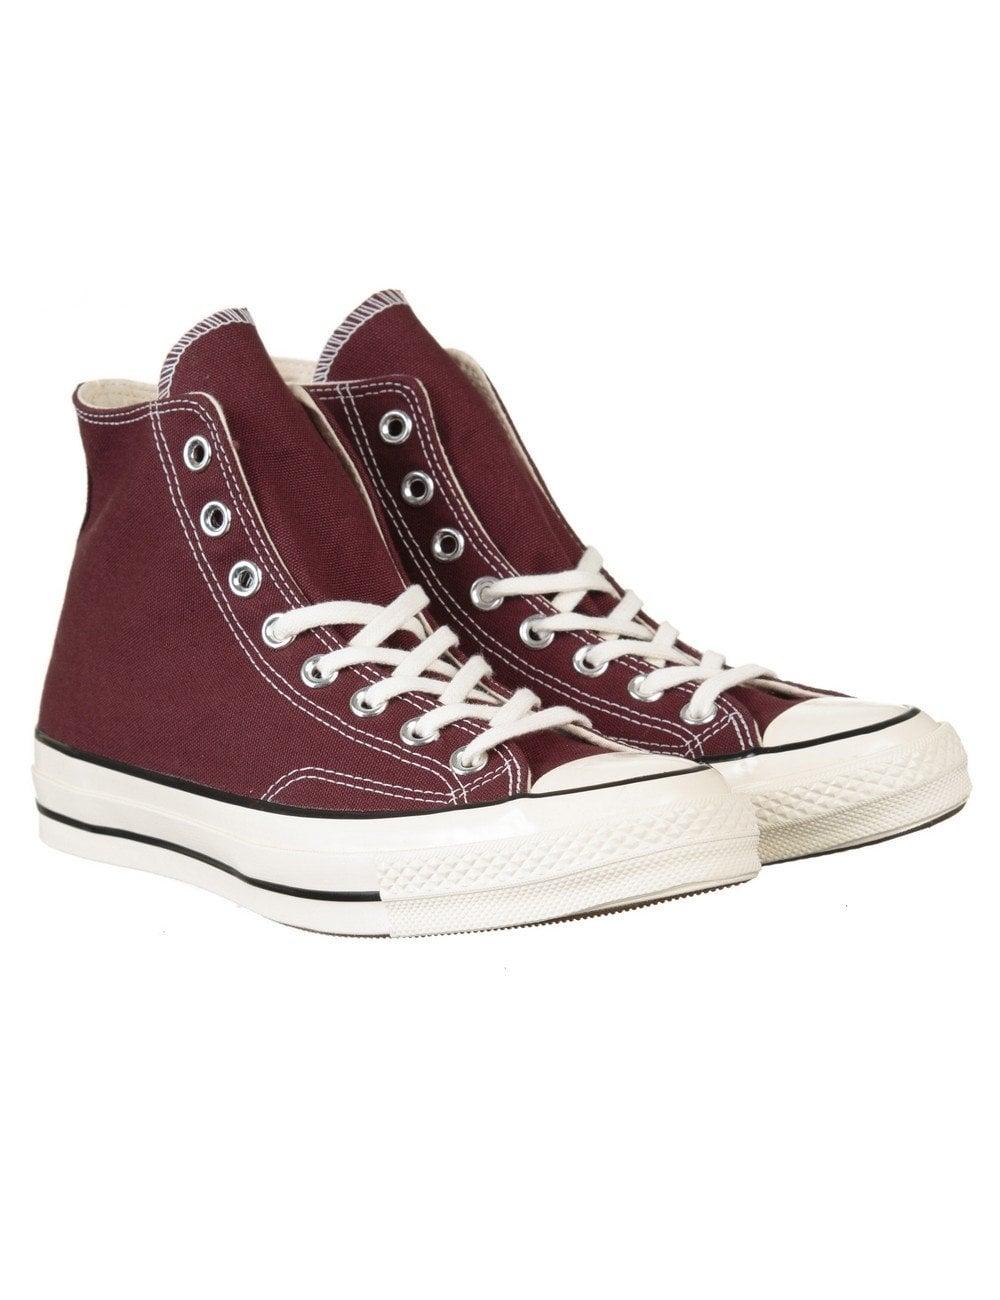 3d38267ba774fd Converse Chuck Taylor 70s Hi Boots - Branch Red - Footwear from Fat ...